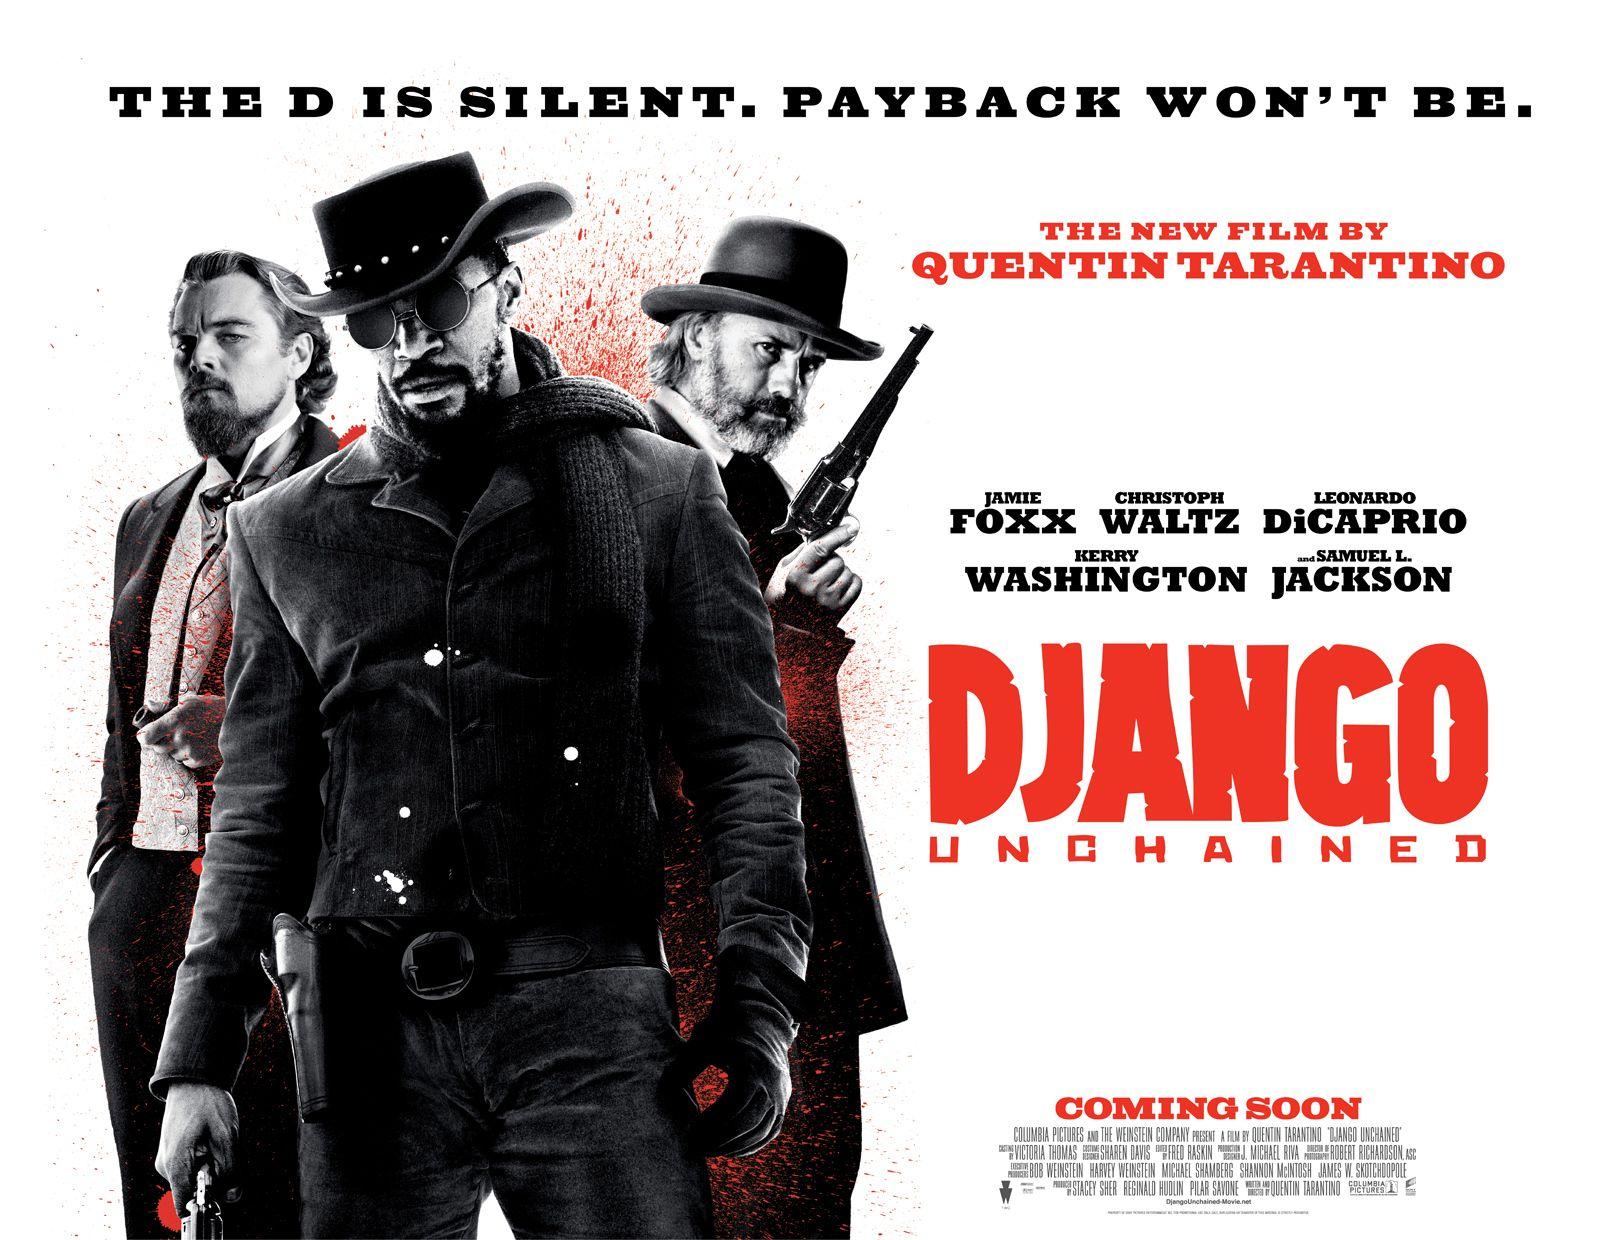 django unchained poster - Αναζήτηση Google (With images) | Django ...